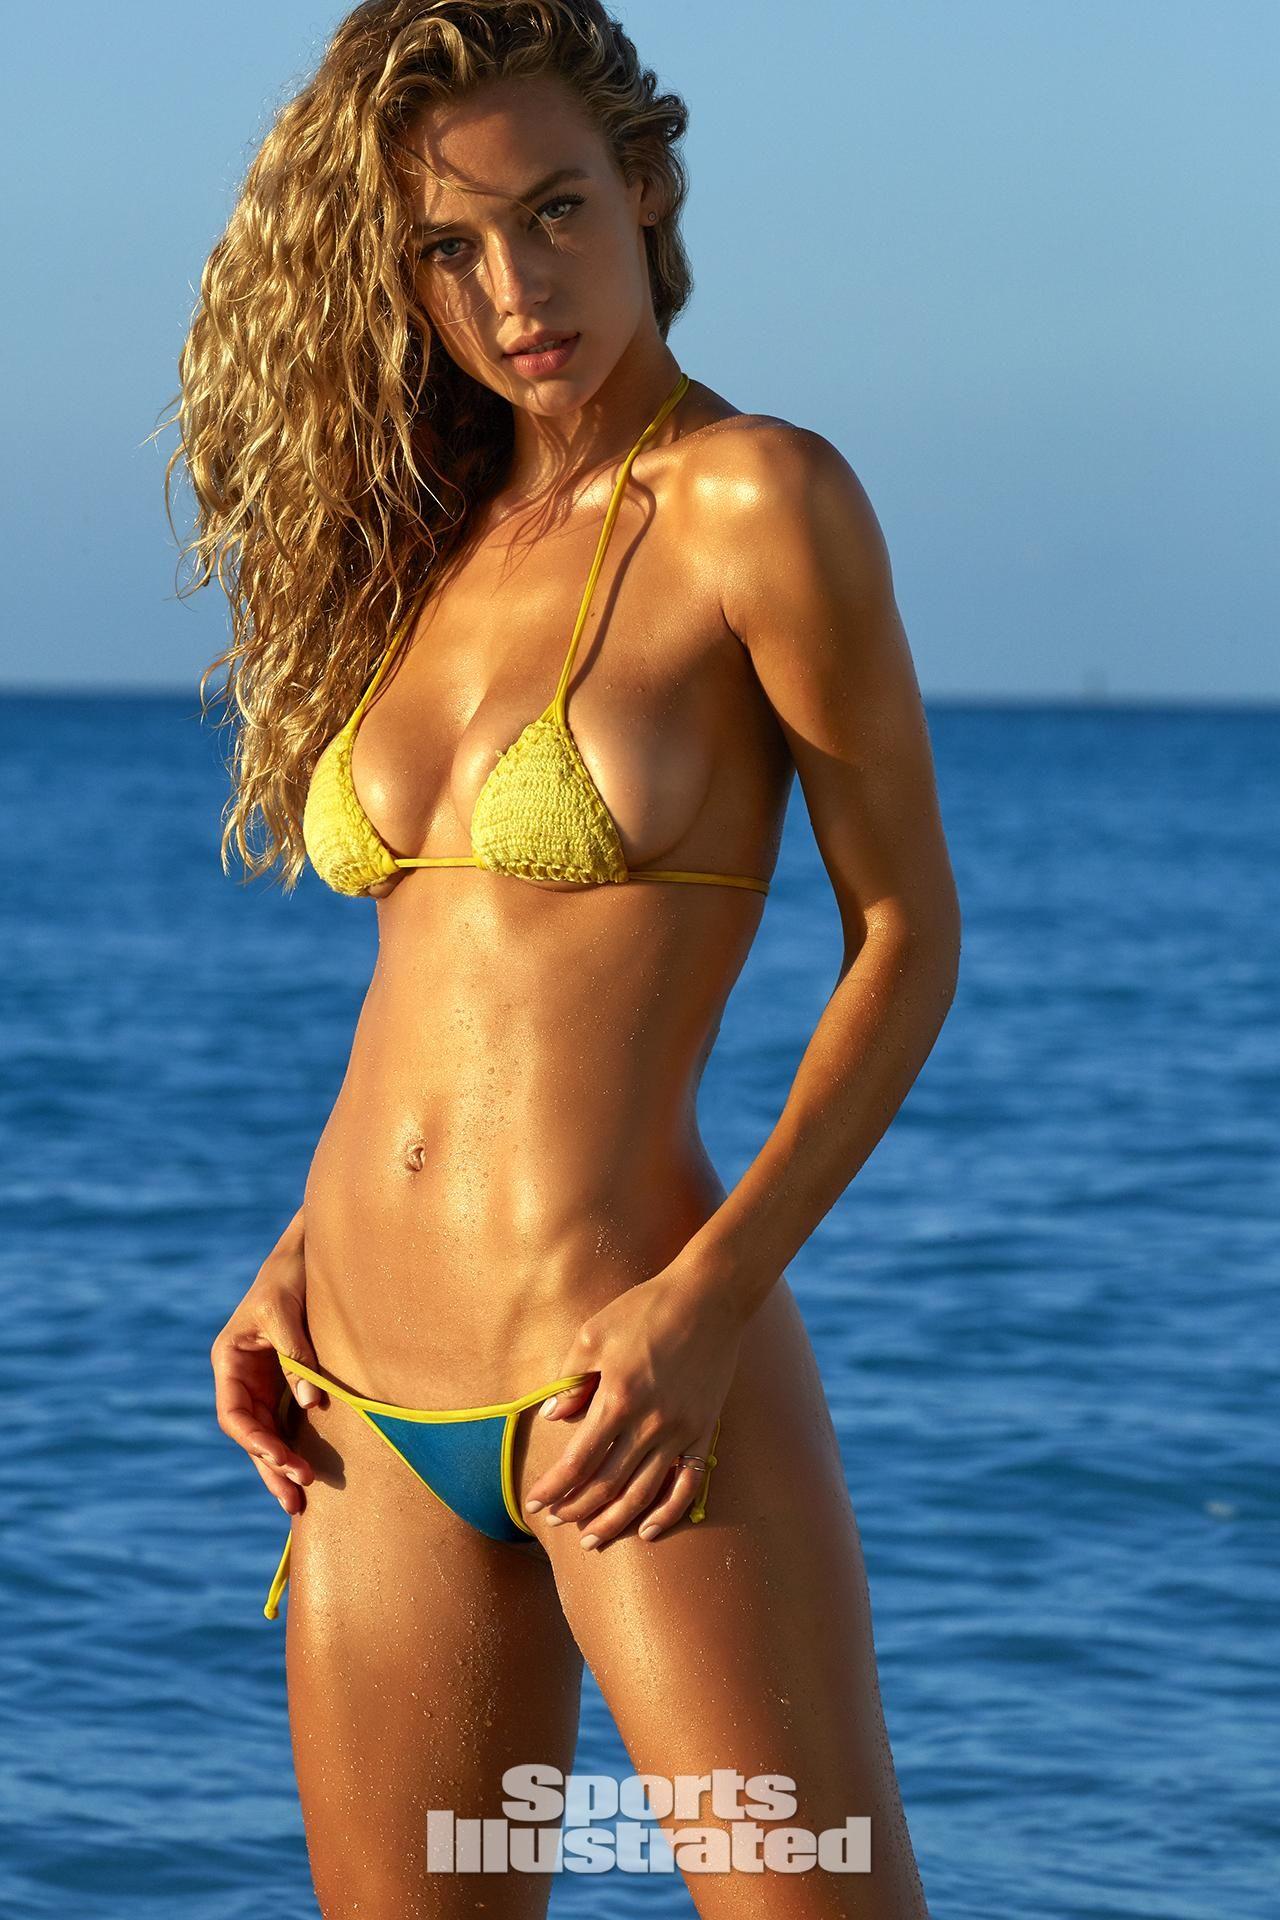 Swimsuit Hannah Gross nudes (39 pics) Boobs, 2020, lingerie